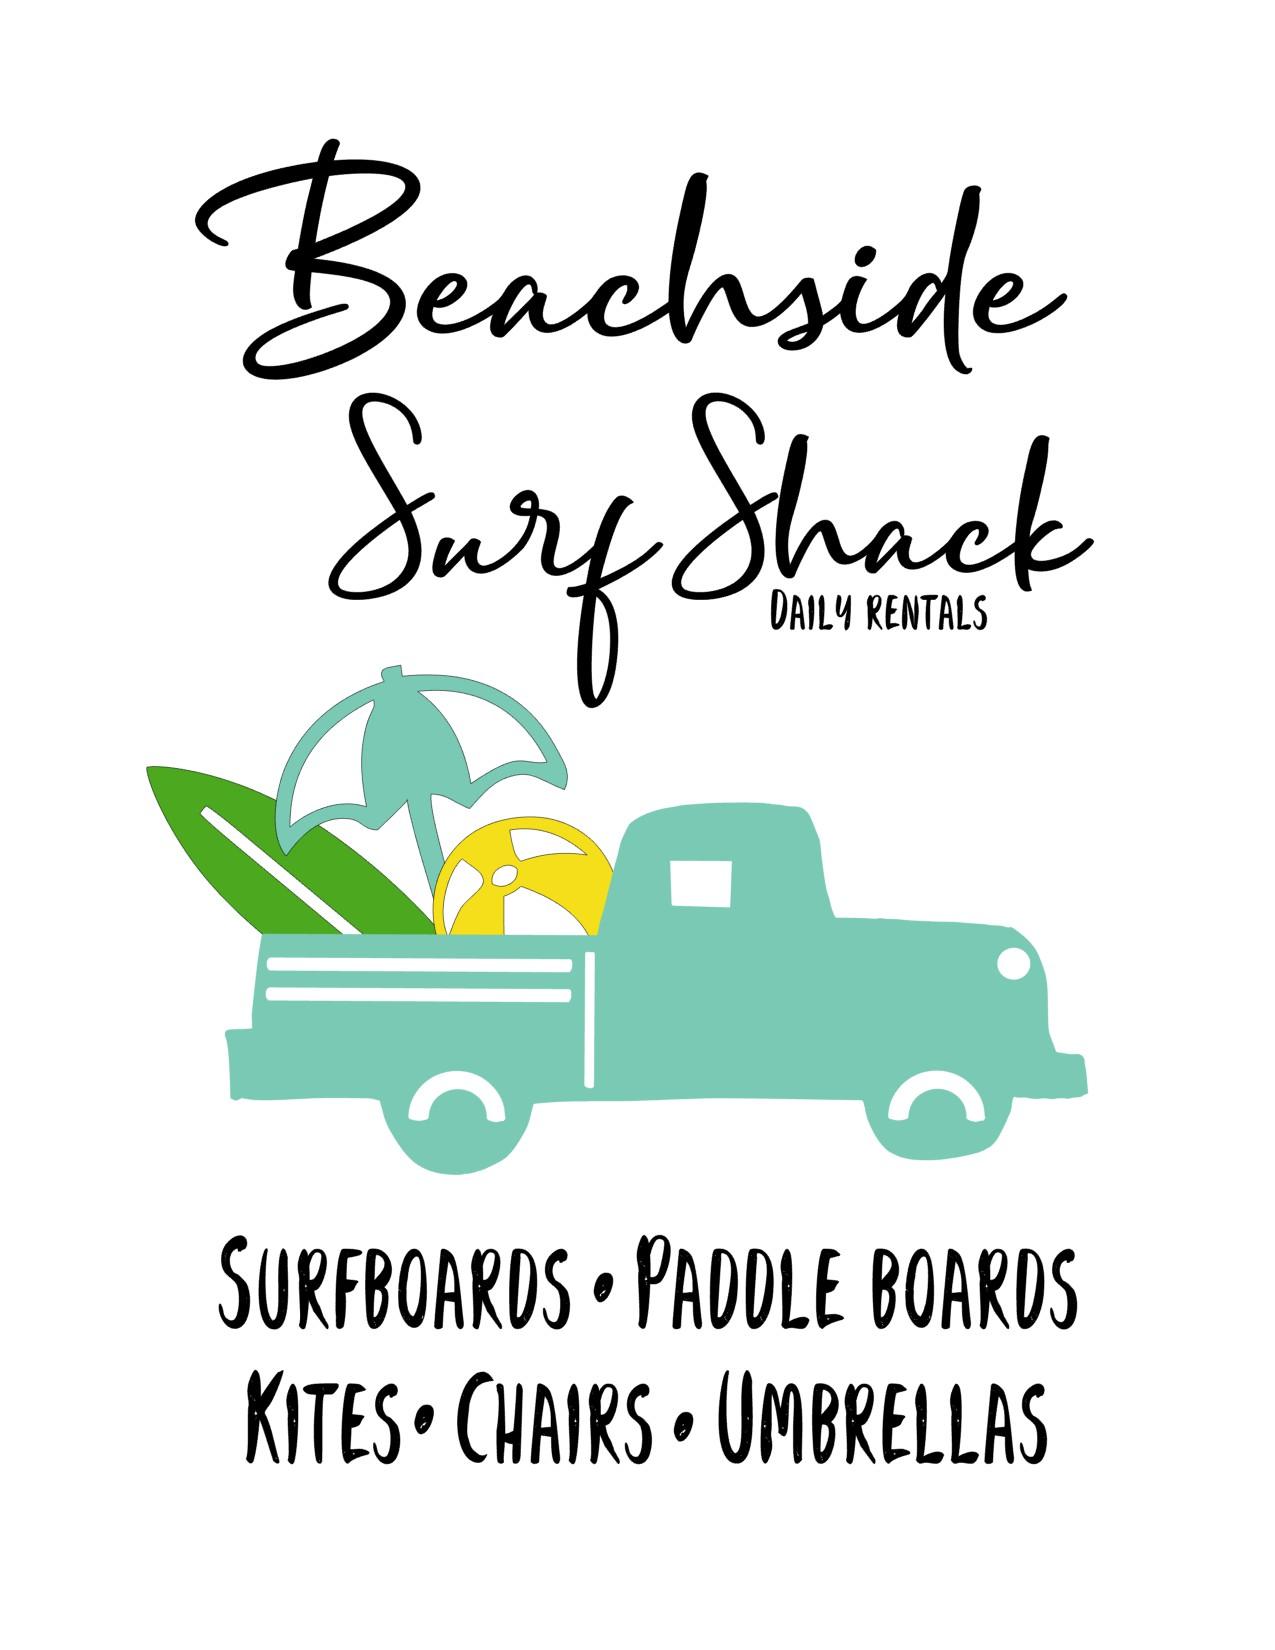 Anchored Soul Surf Shack Aqua Truck